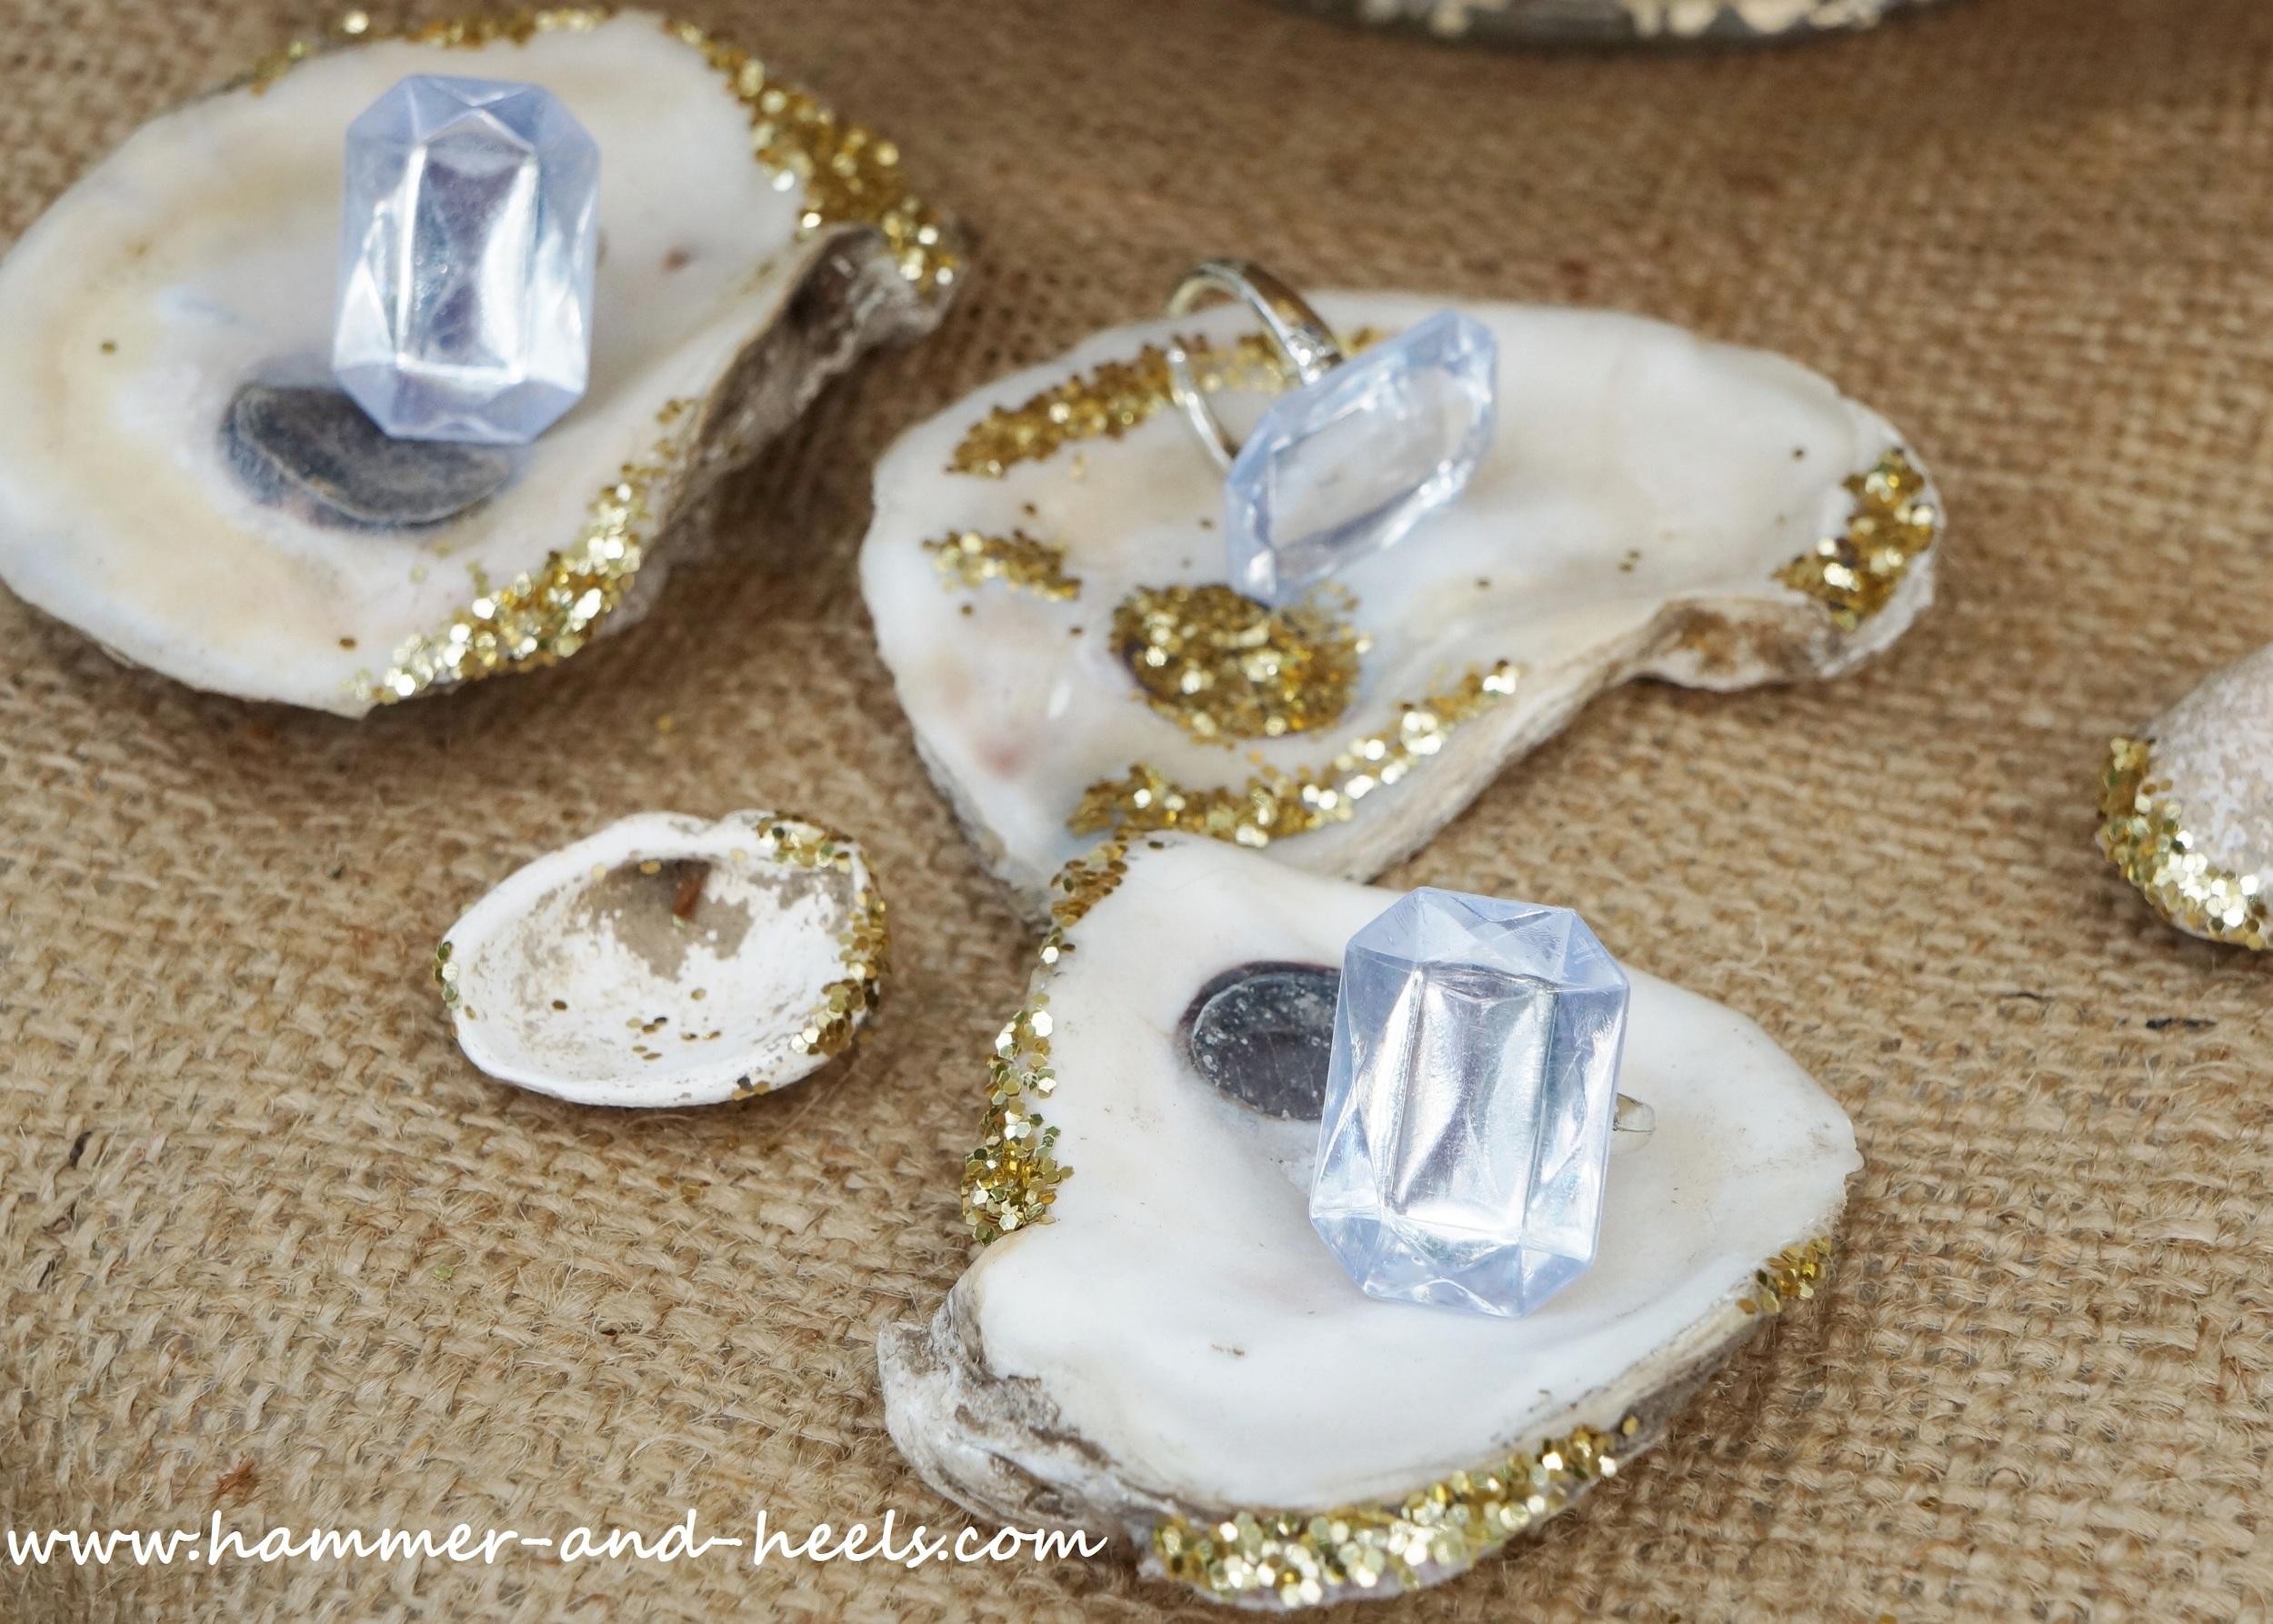 Dominique's glitter oyster shells!